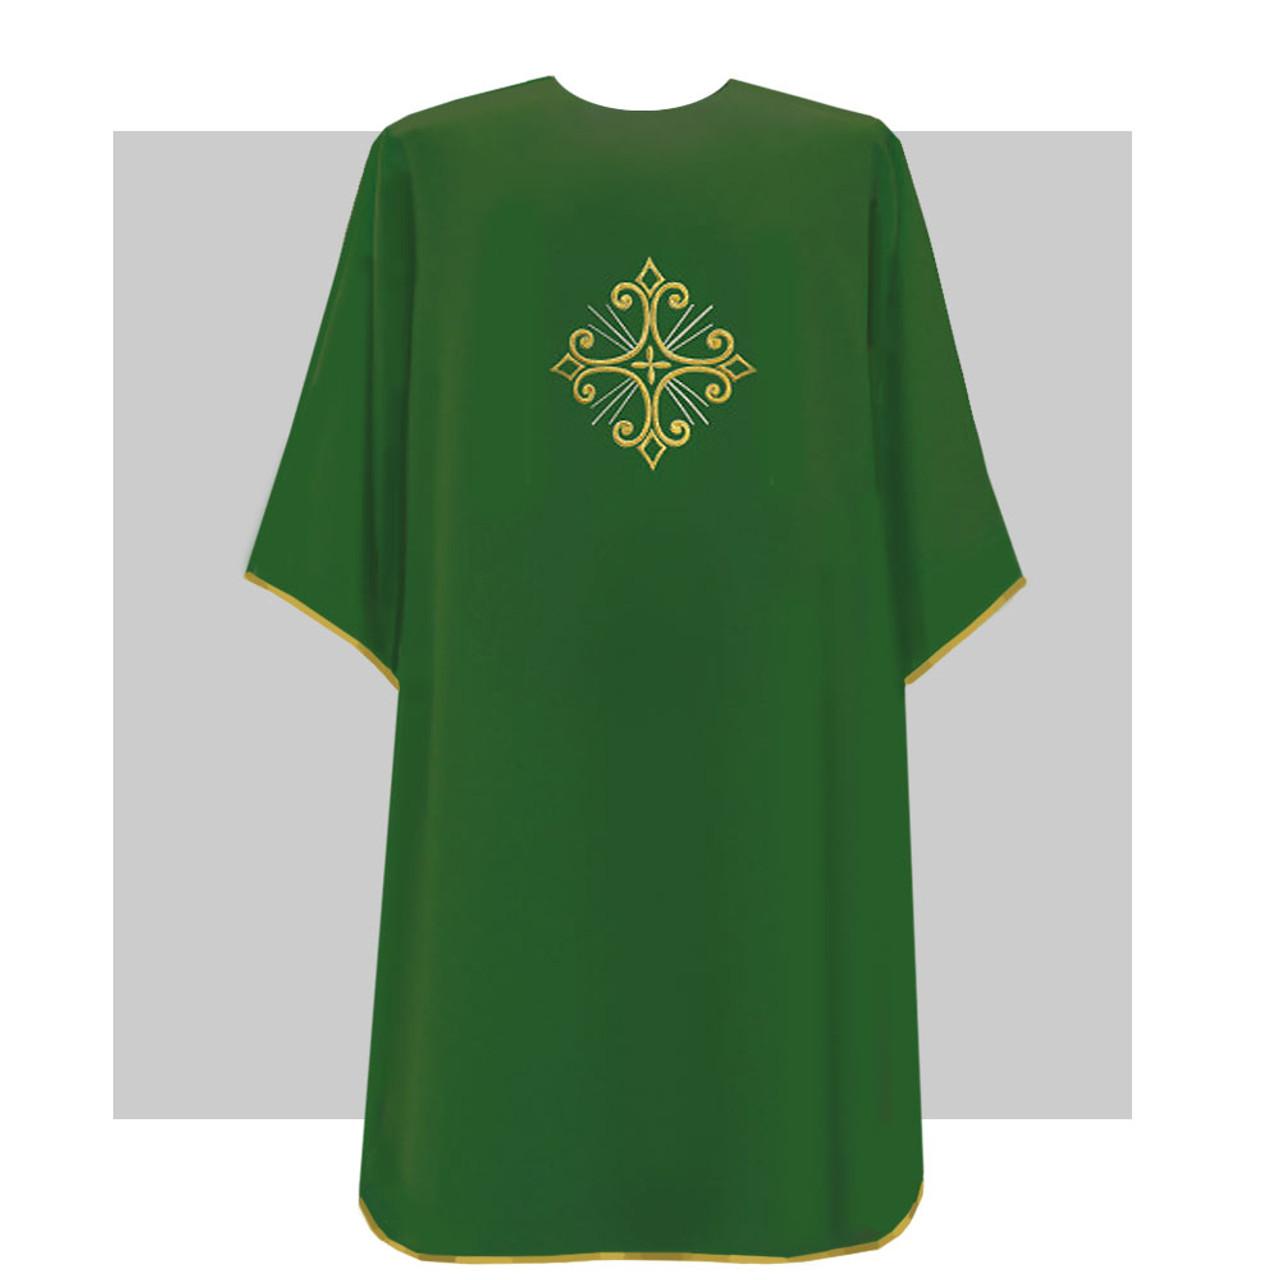 351 Green Dalmatic from Solivari